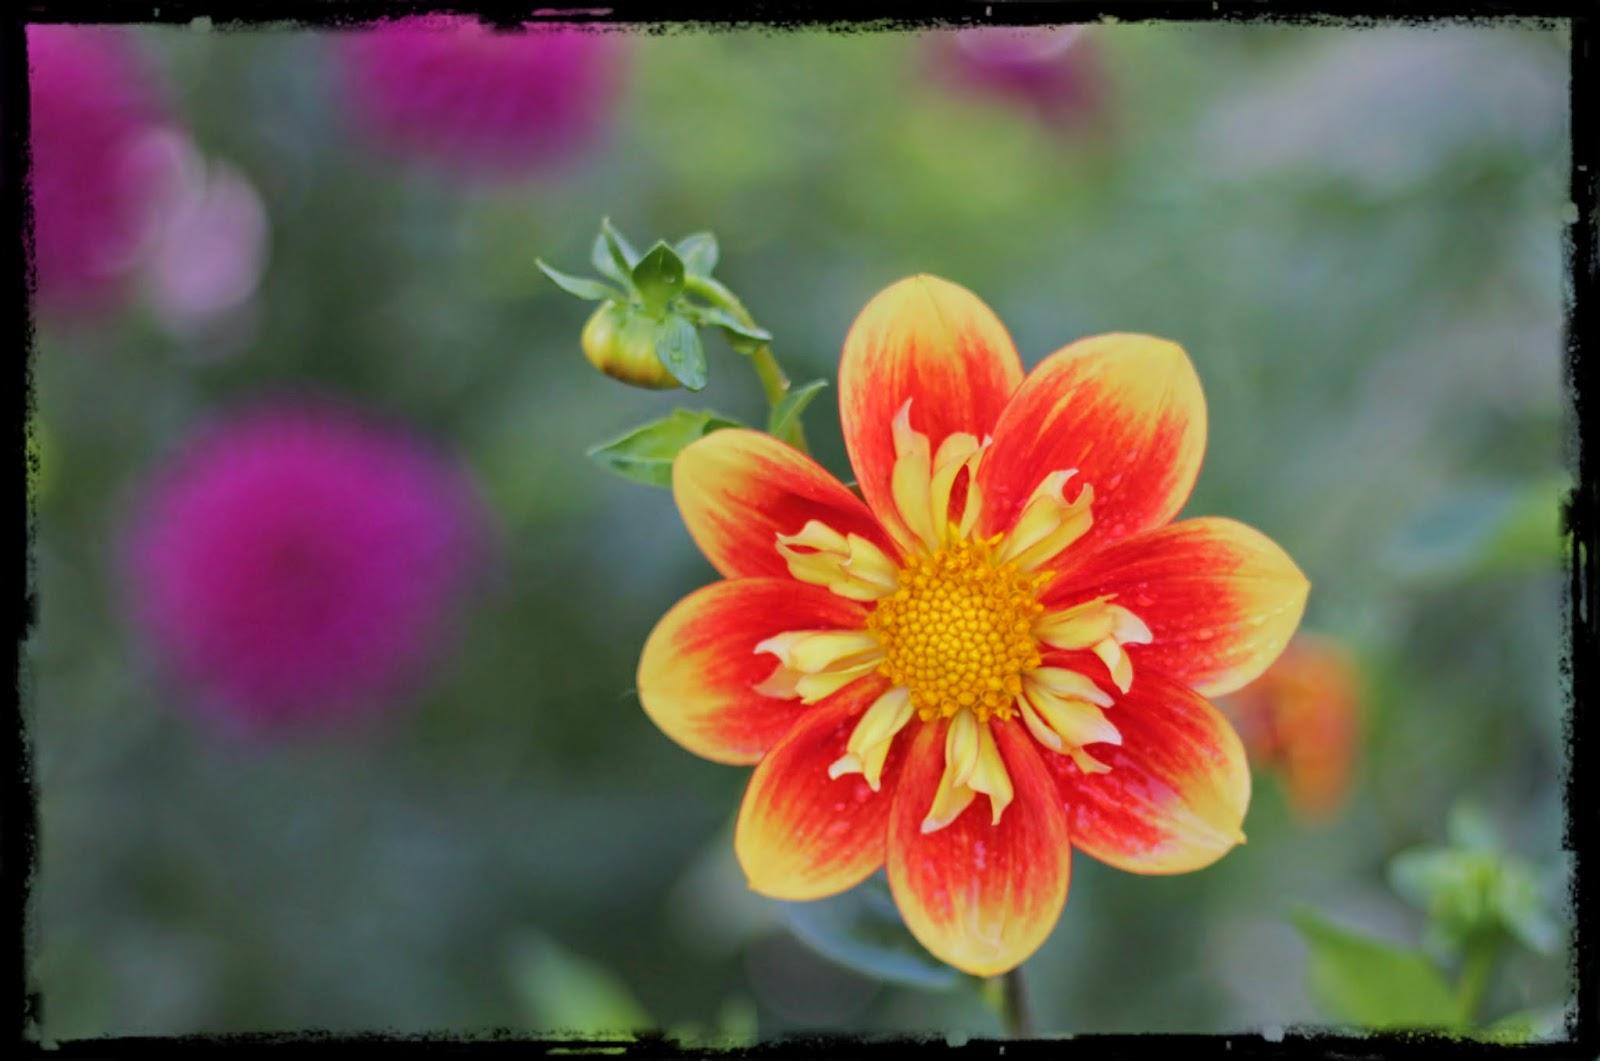 Flower at Manito Park, Spokane, Washington